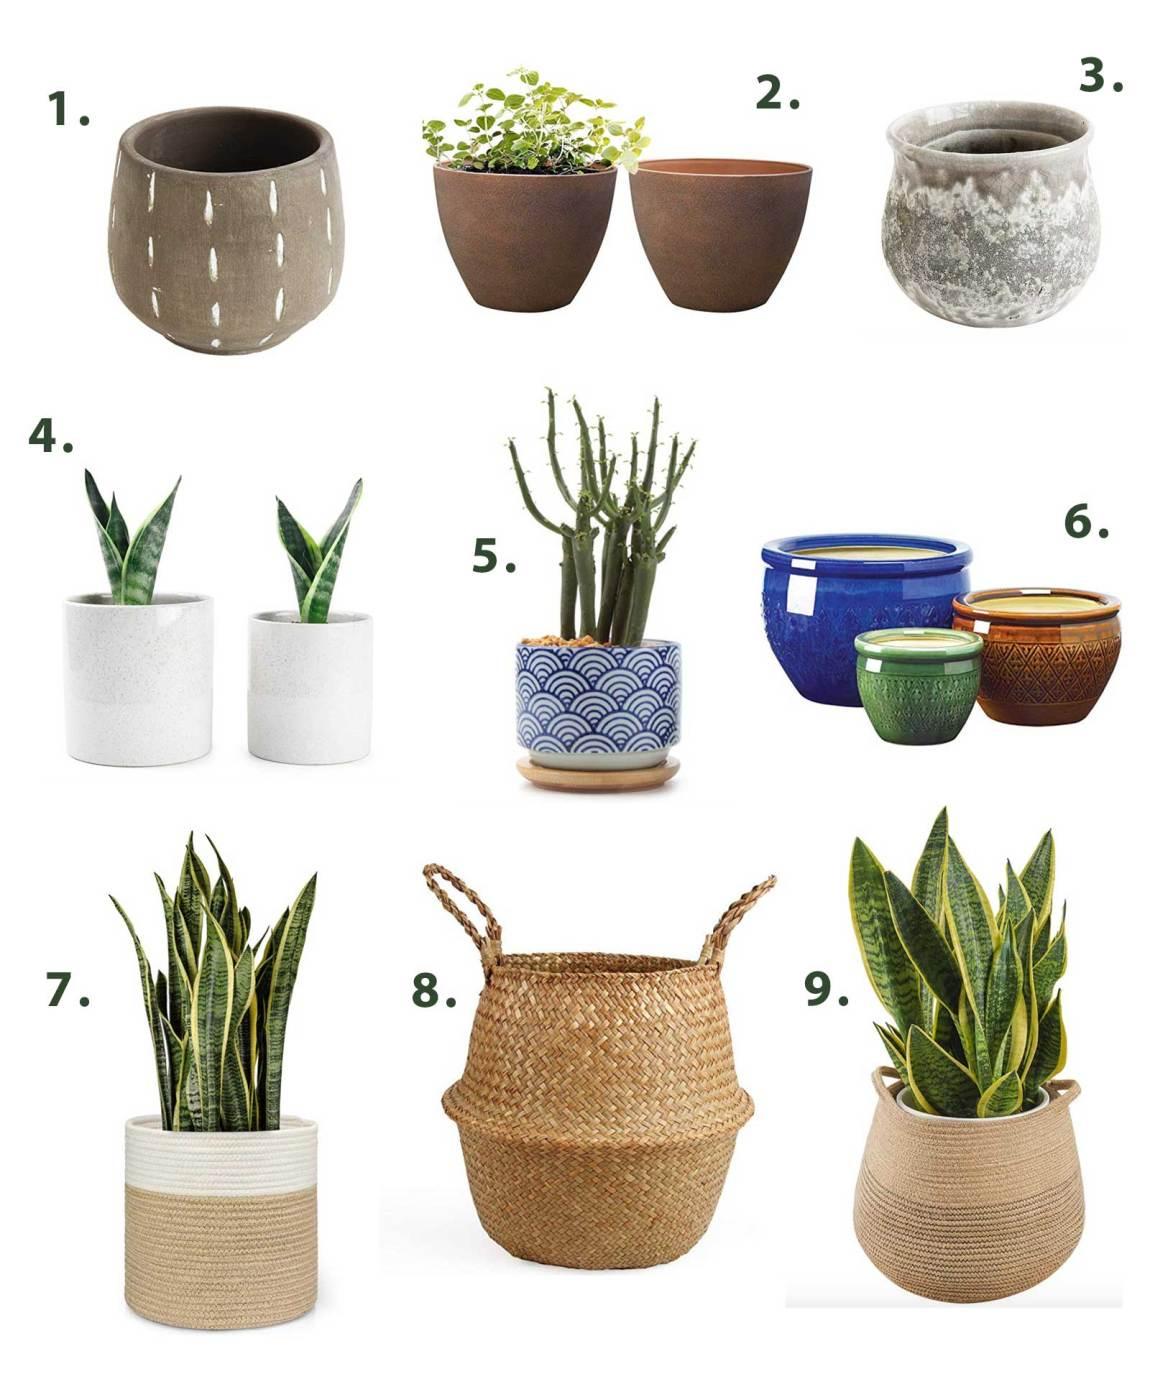 Plastic-Free plant pot options